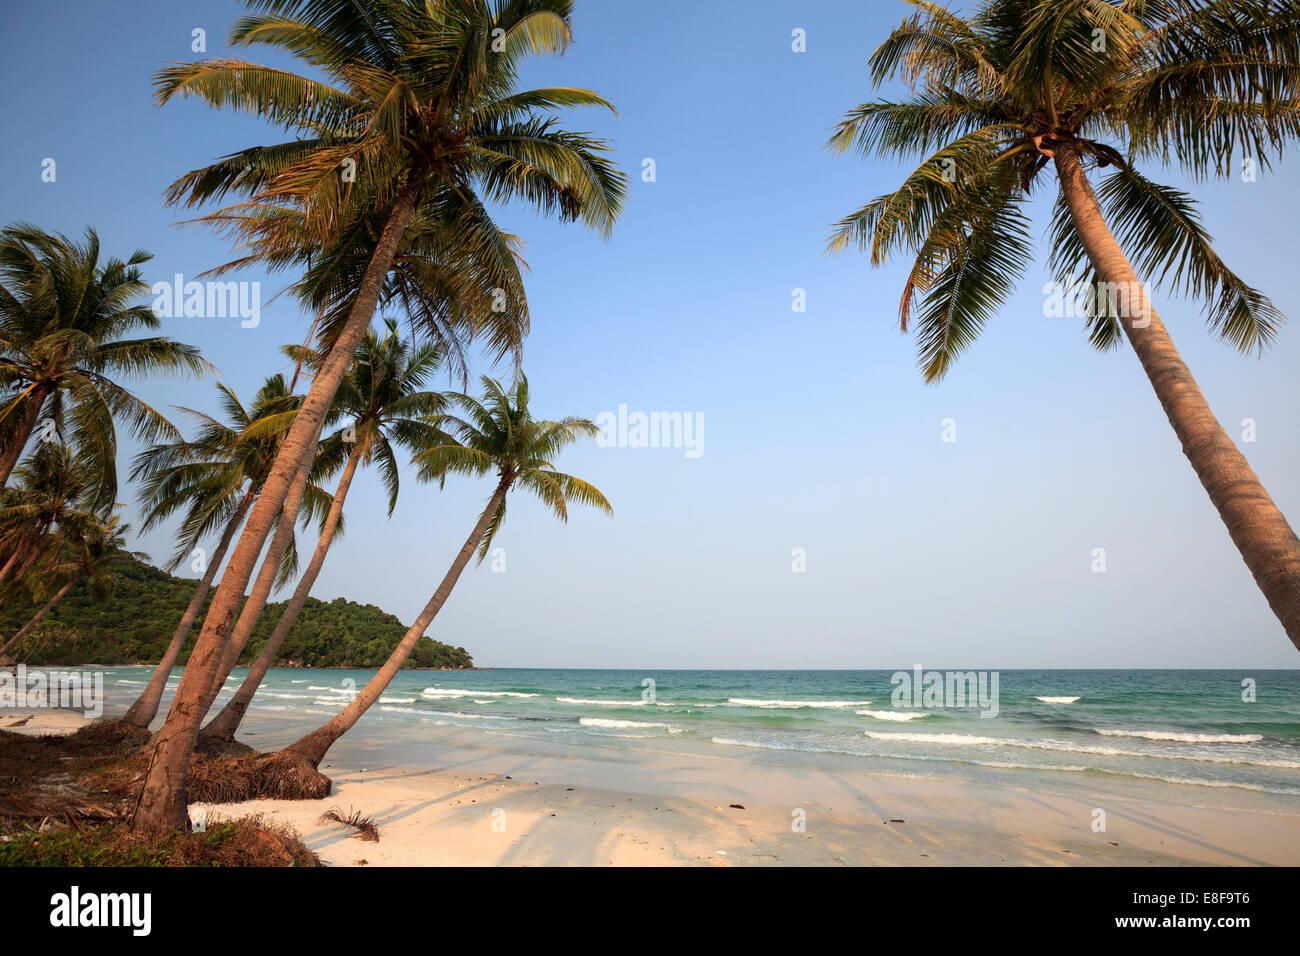 Vietnam, Phu Quoc, Sao Beach - Stock Image